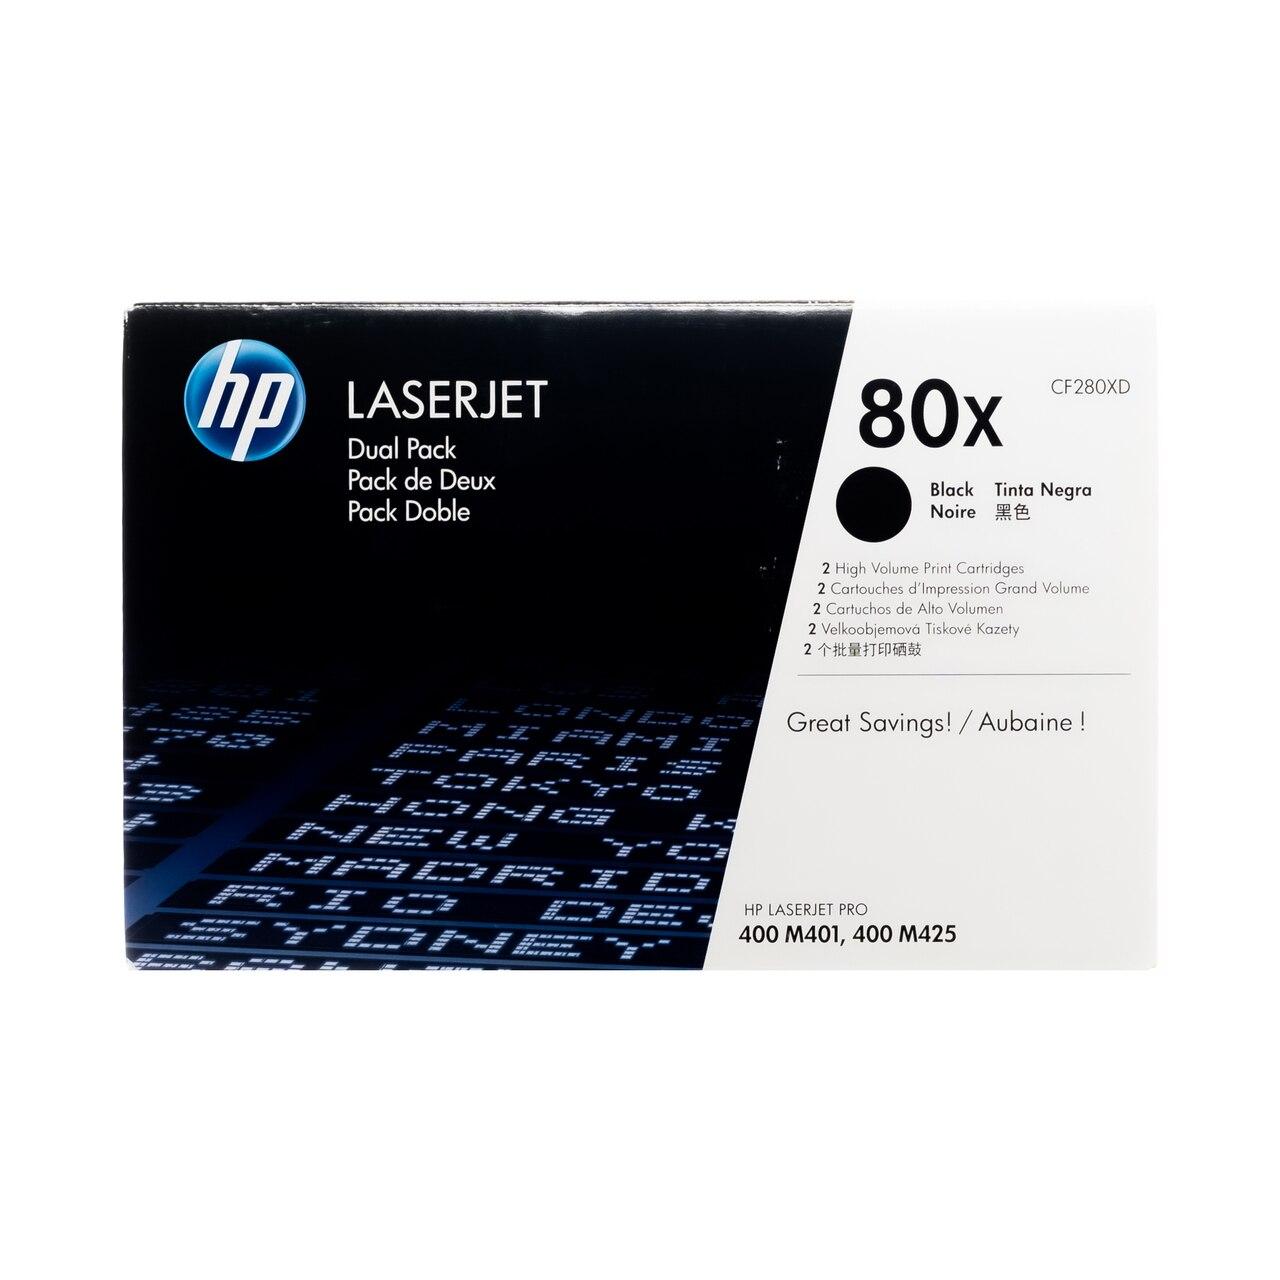 CF280XD SET | HP 80X | Original HP High-Yield LaserJet Toner Cartridges - 2-Pack - Black